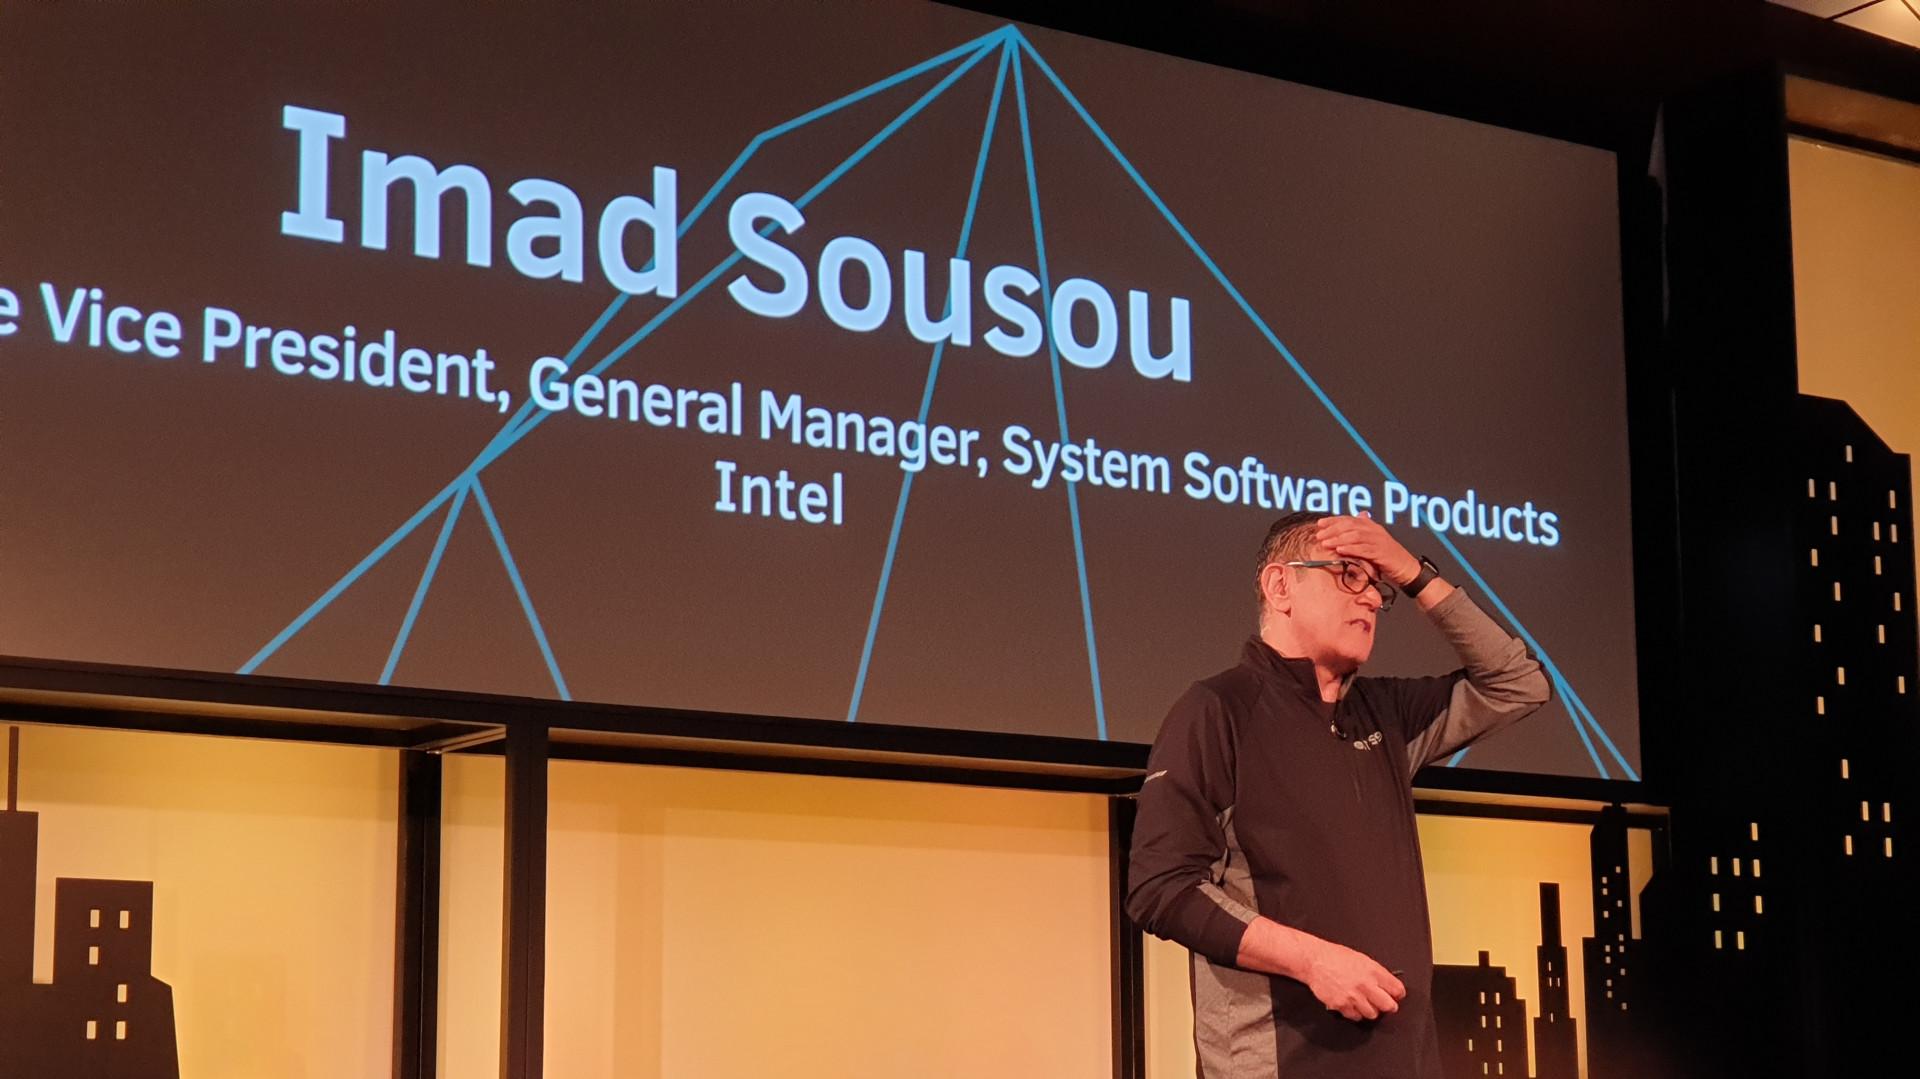 Intels freie ModernFW soll bestehende UEFI-Firmware ersetzen